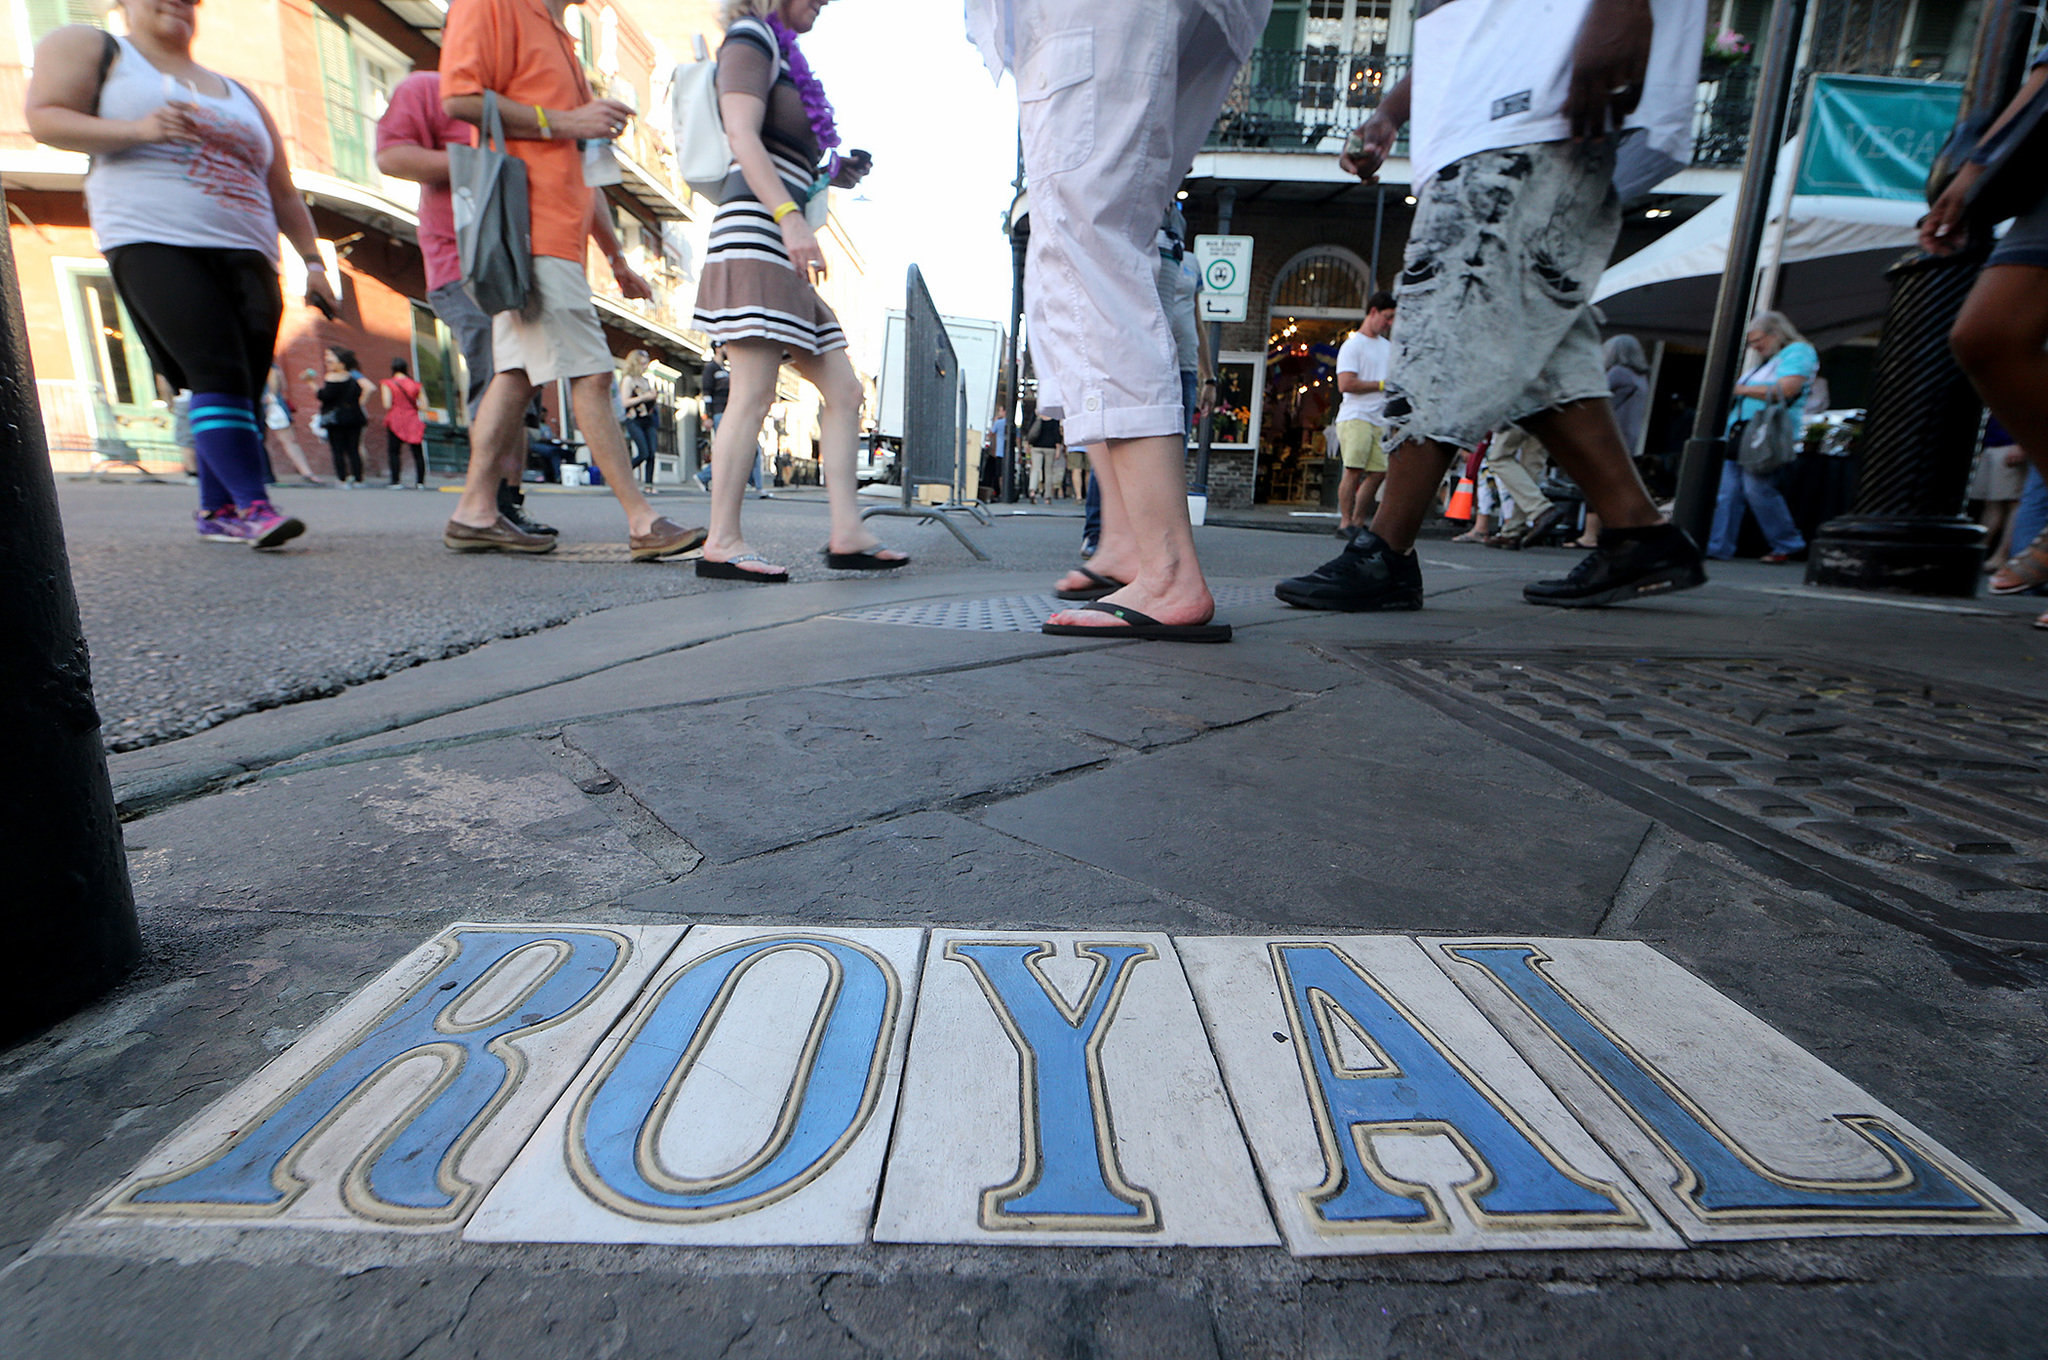 Royal Street (photo credit: nola.com)